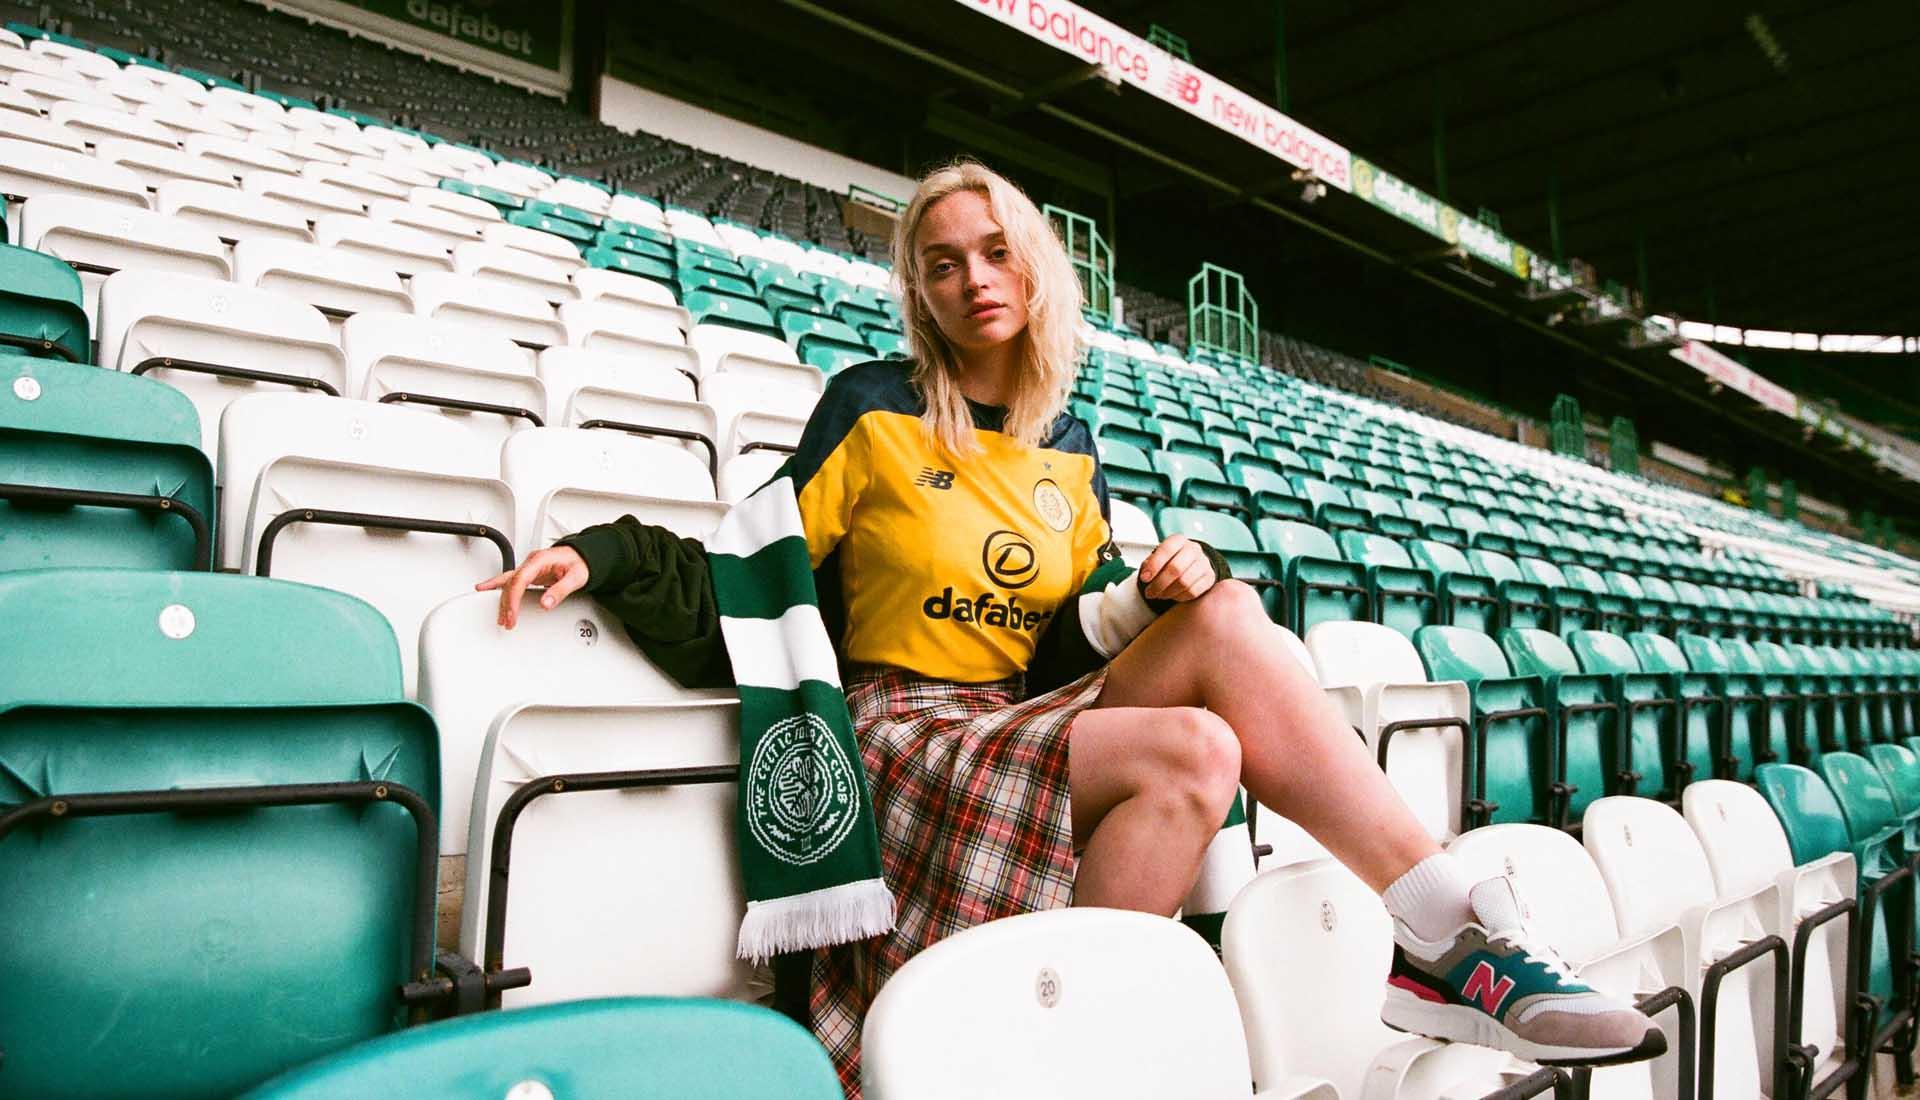 Balance 201920 Celtic New Lookbook Present SoccerBible NwXn0PkO8Z